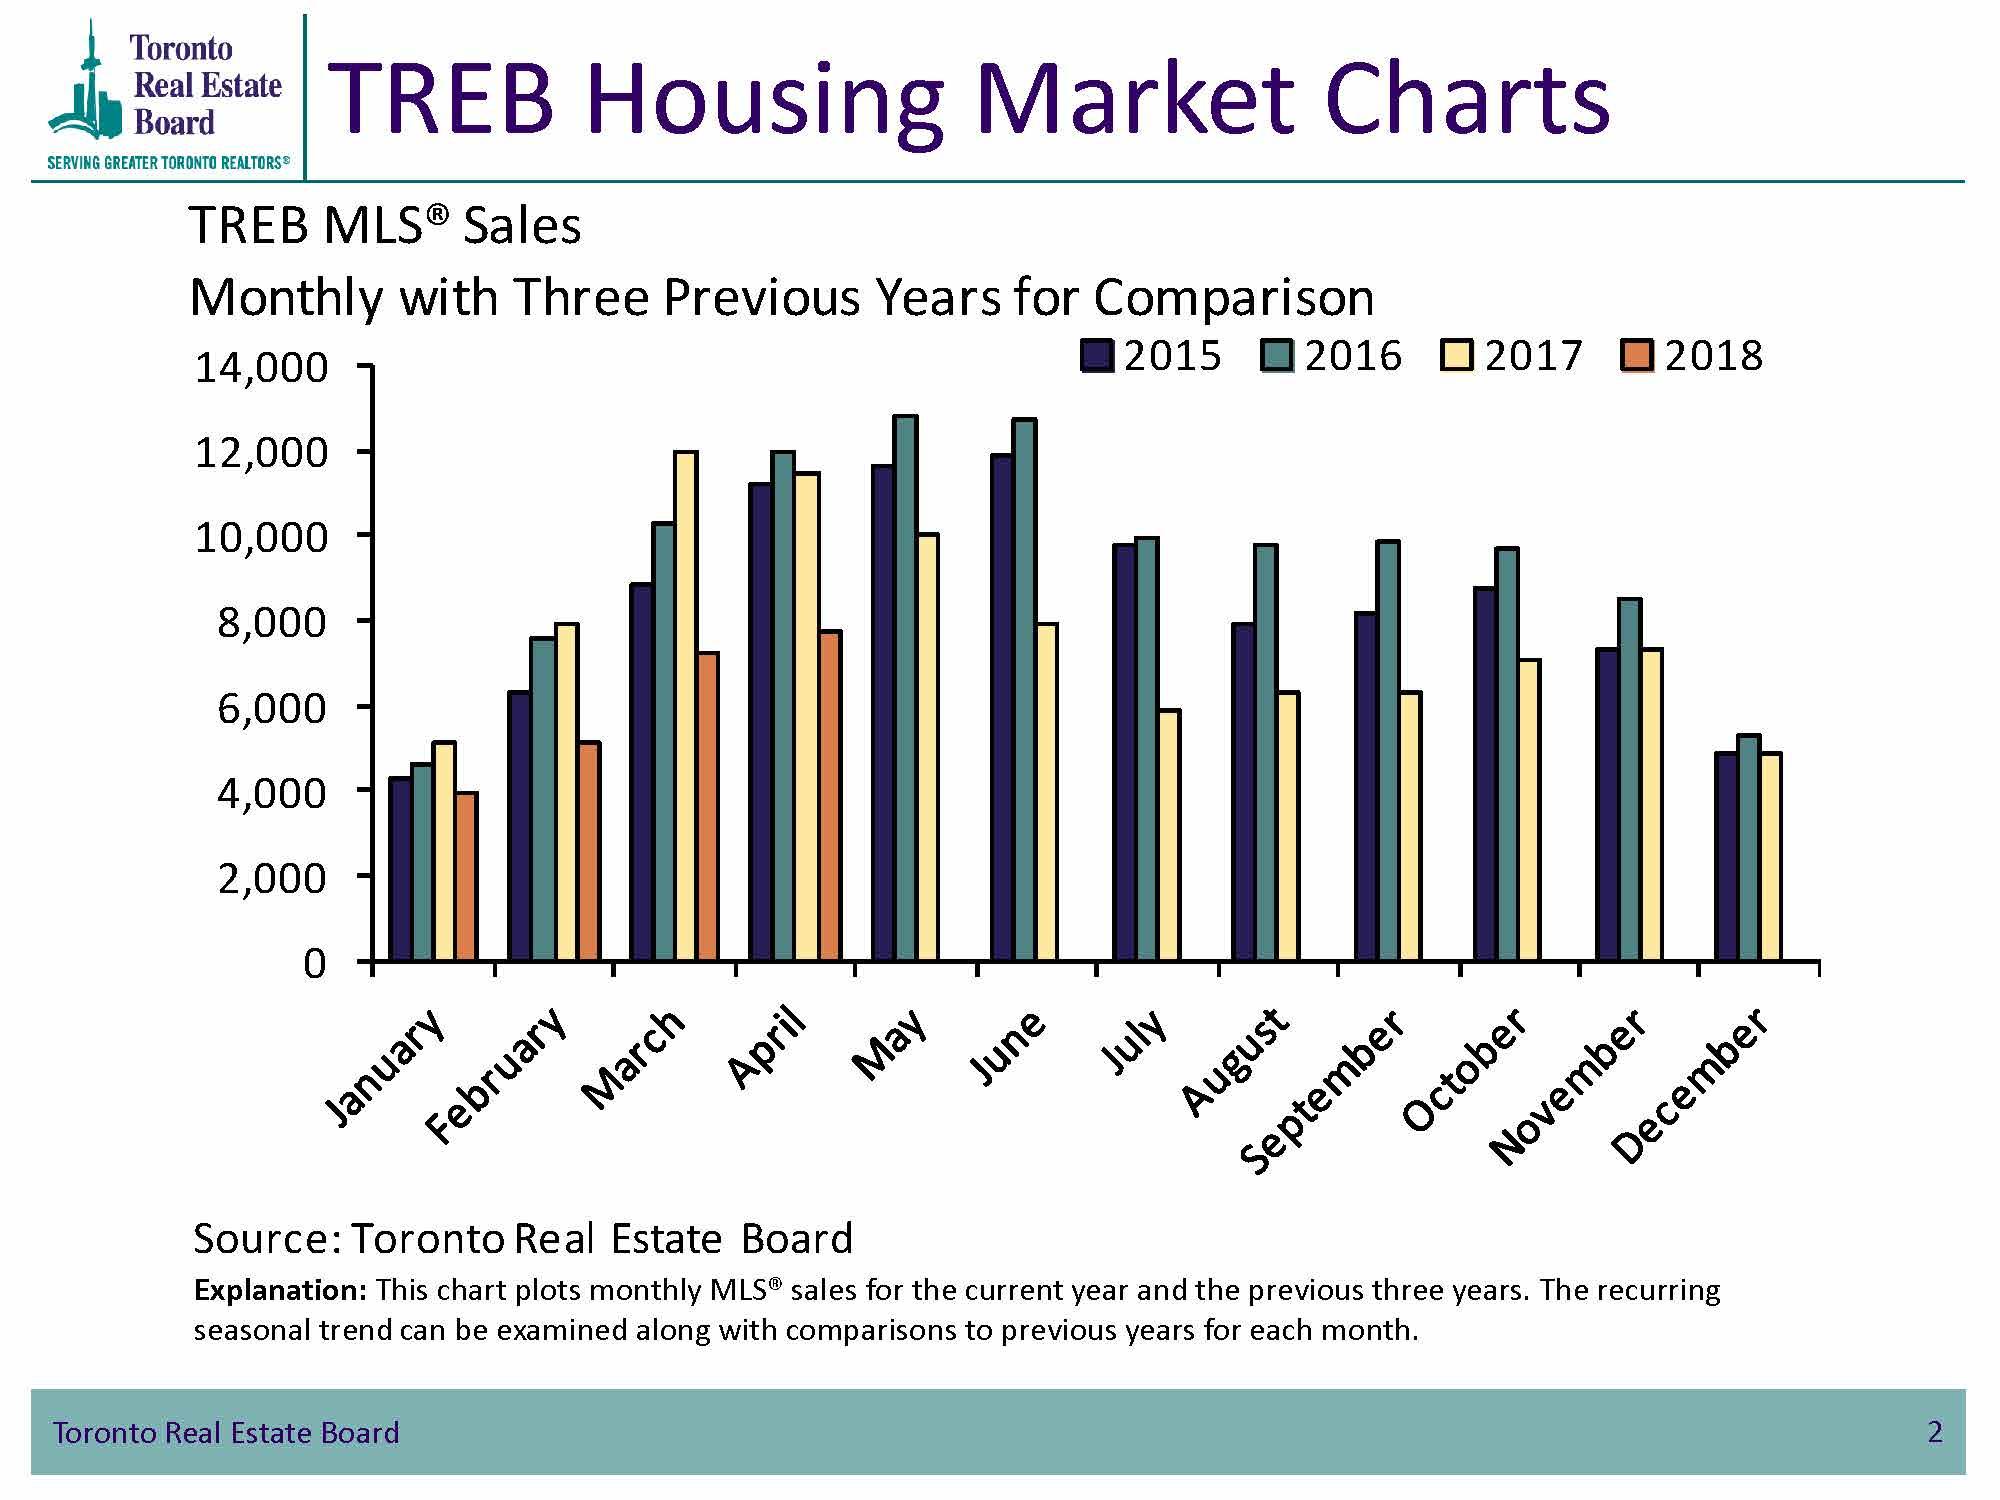 TREB Housing Market Charts - TorontoMLS Sales